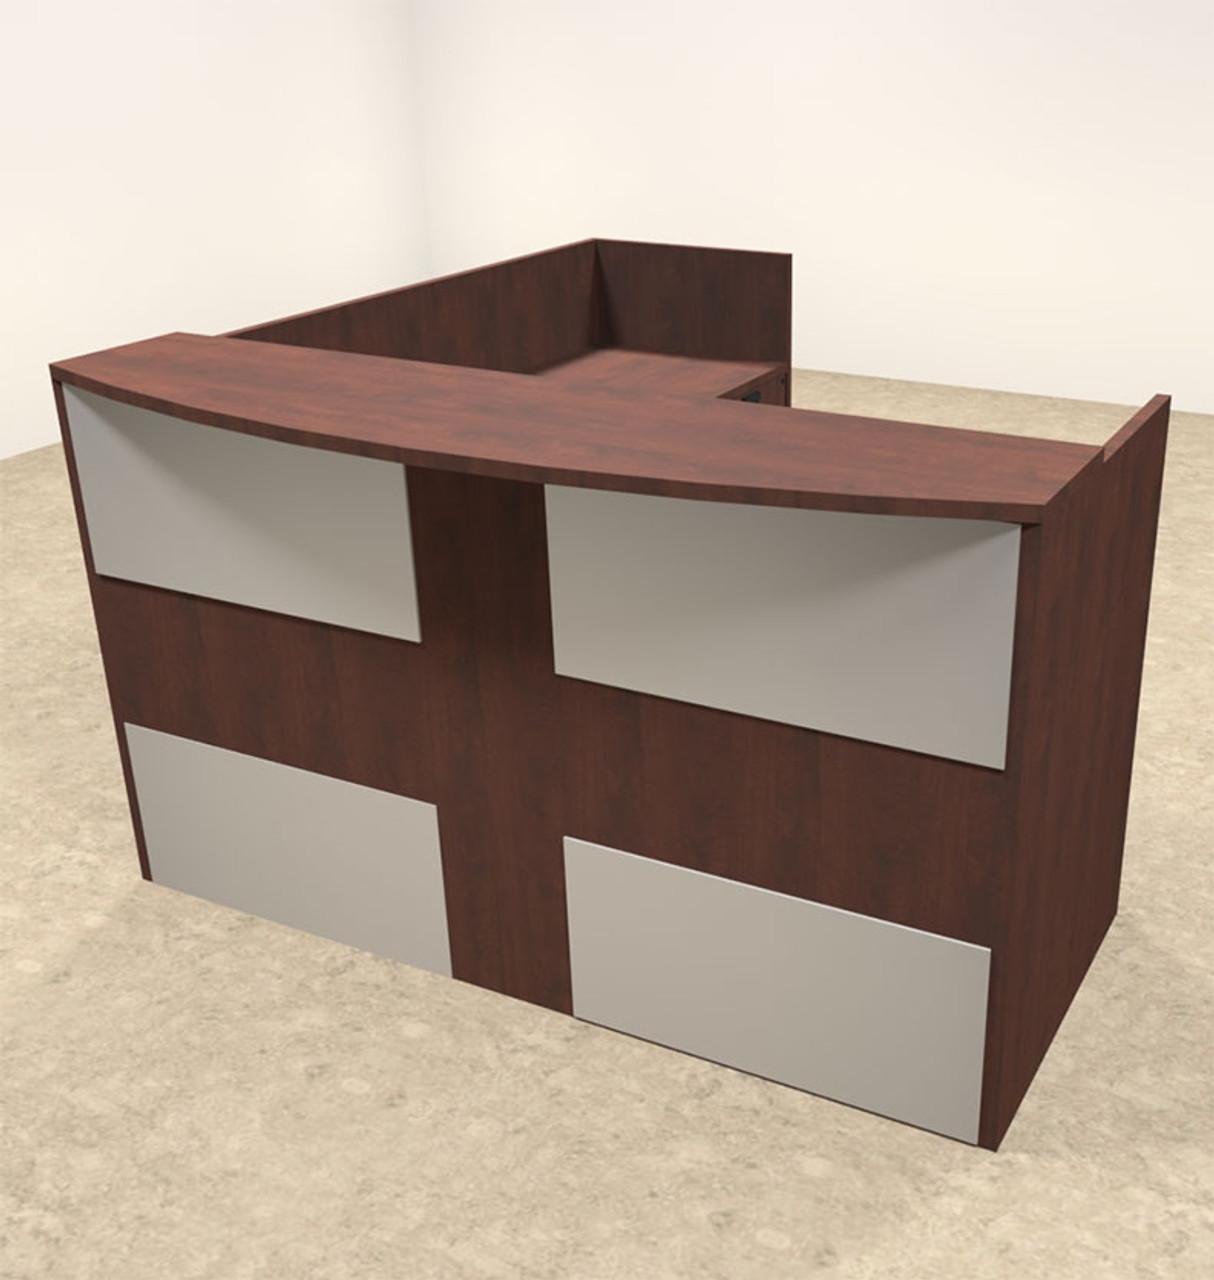 3pc L Shaped Modern Acrylic Panel Office Reception Desk, #OT-SUL-R22